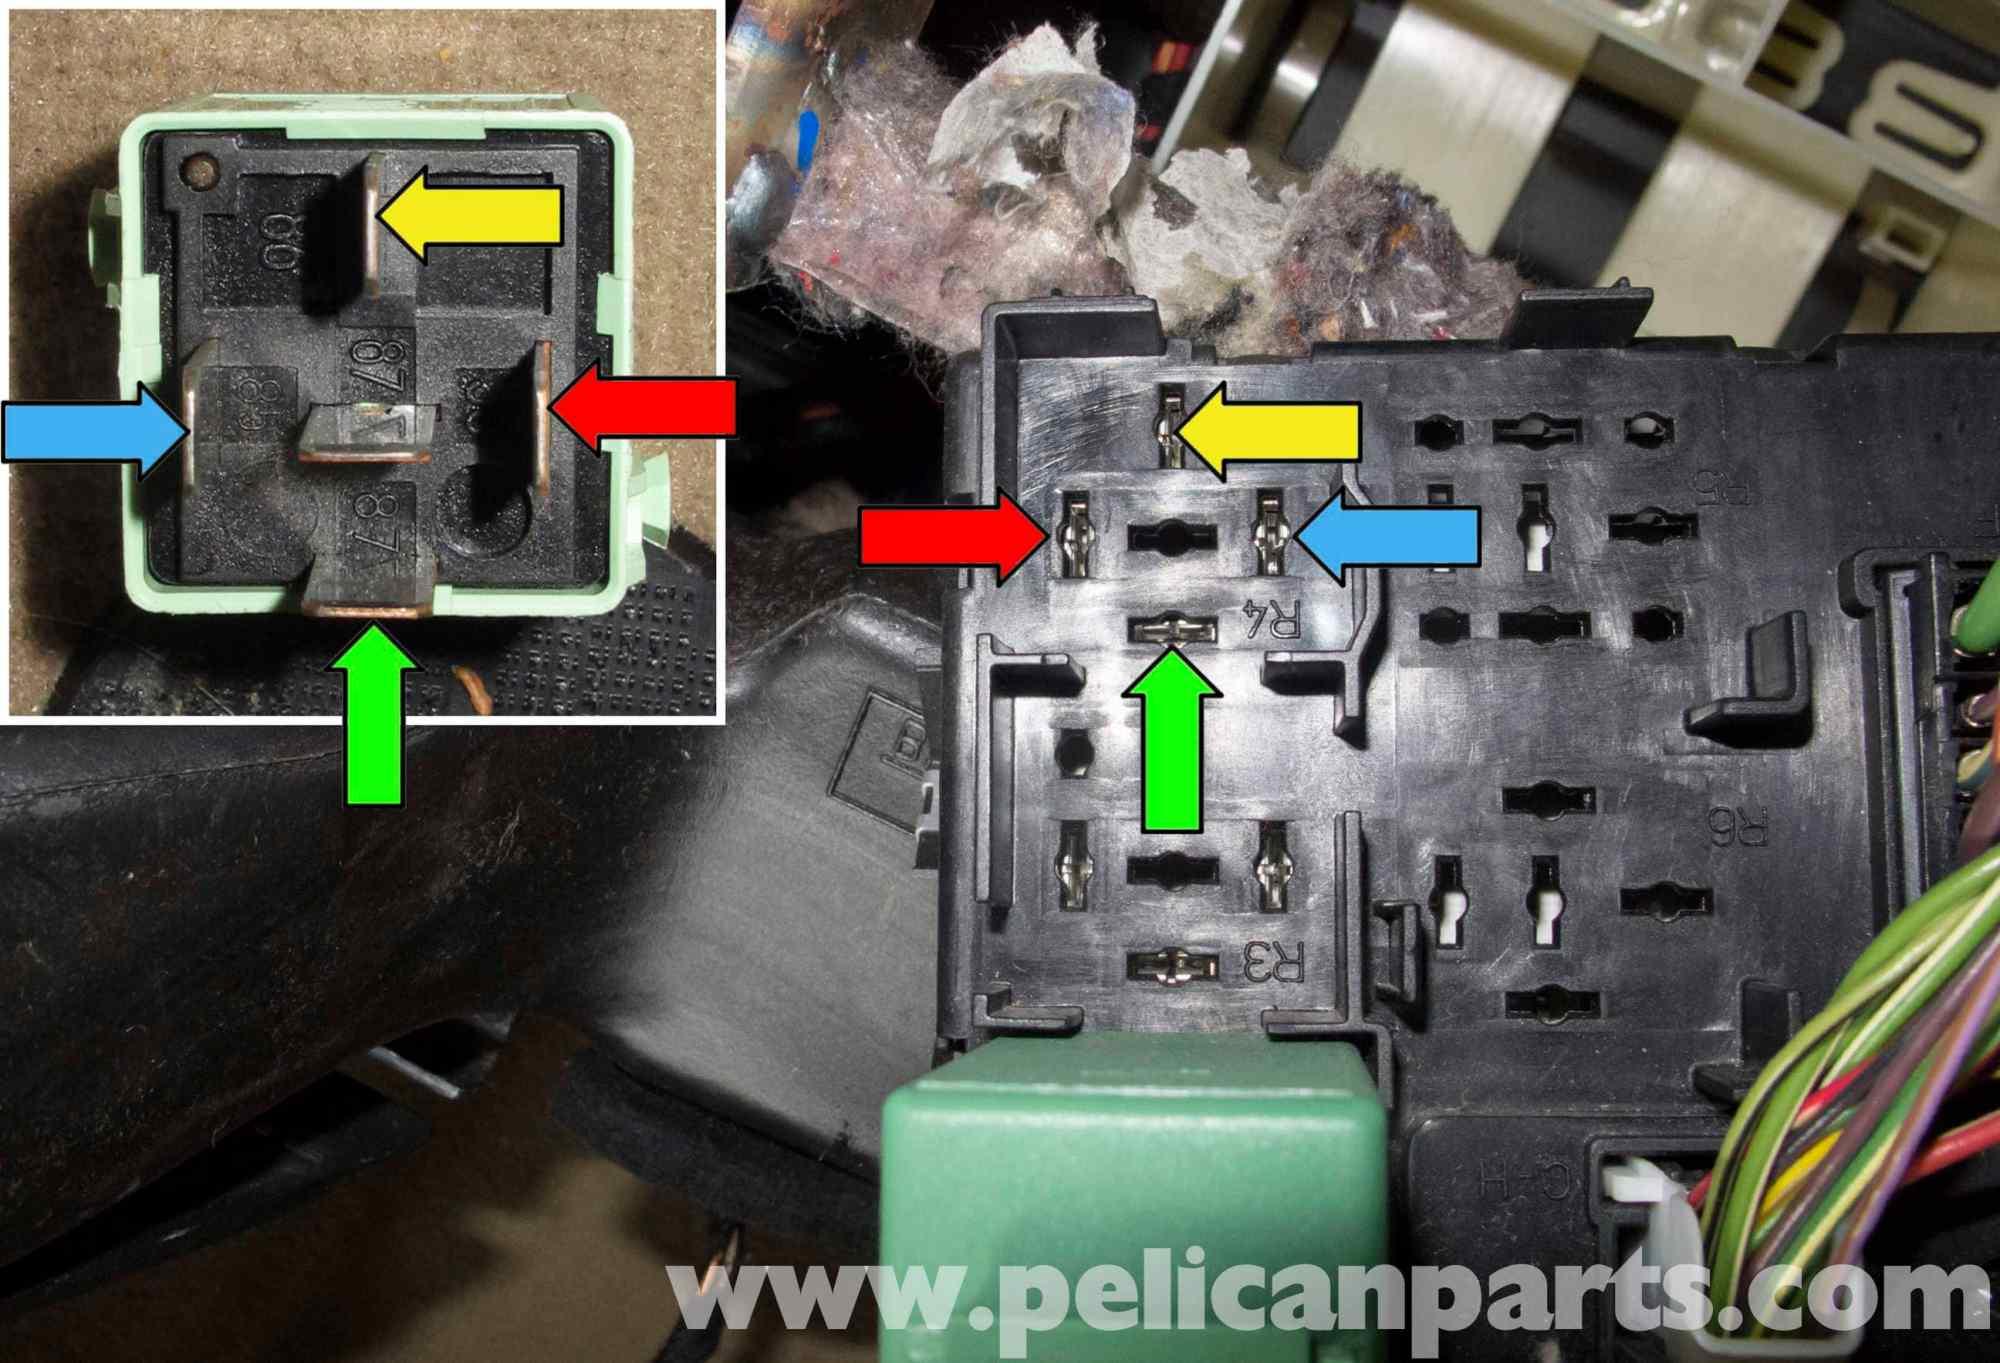 hight resolution of bmw x5 fuel pump testing e53 2000 2006 pelican parts diy bmw x5 fuel pump wiring diagram